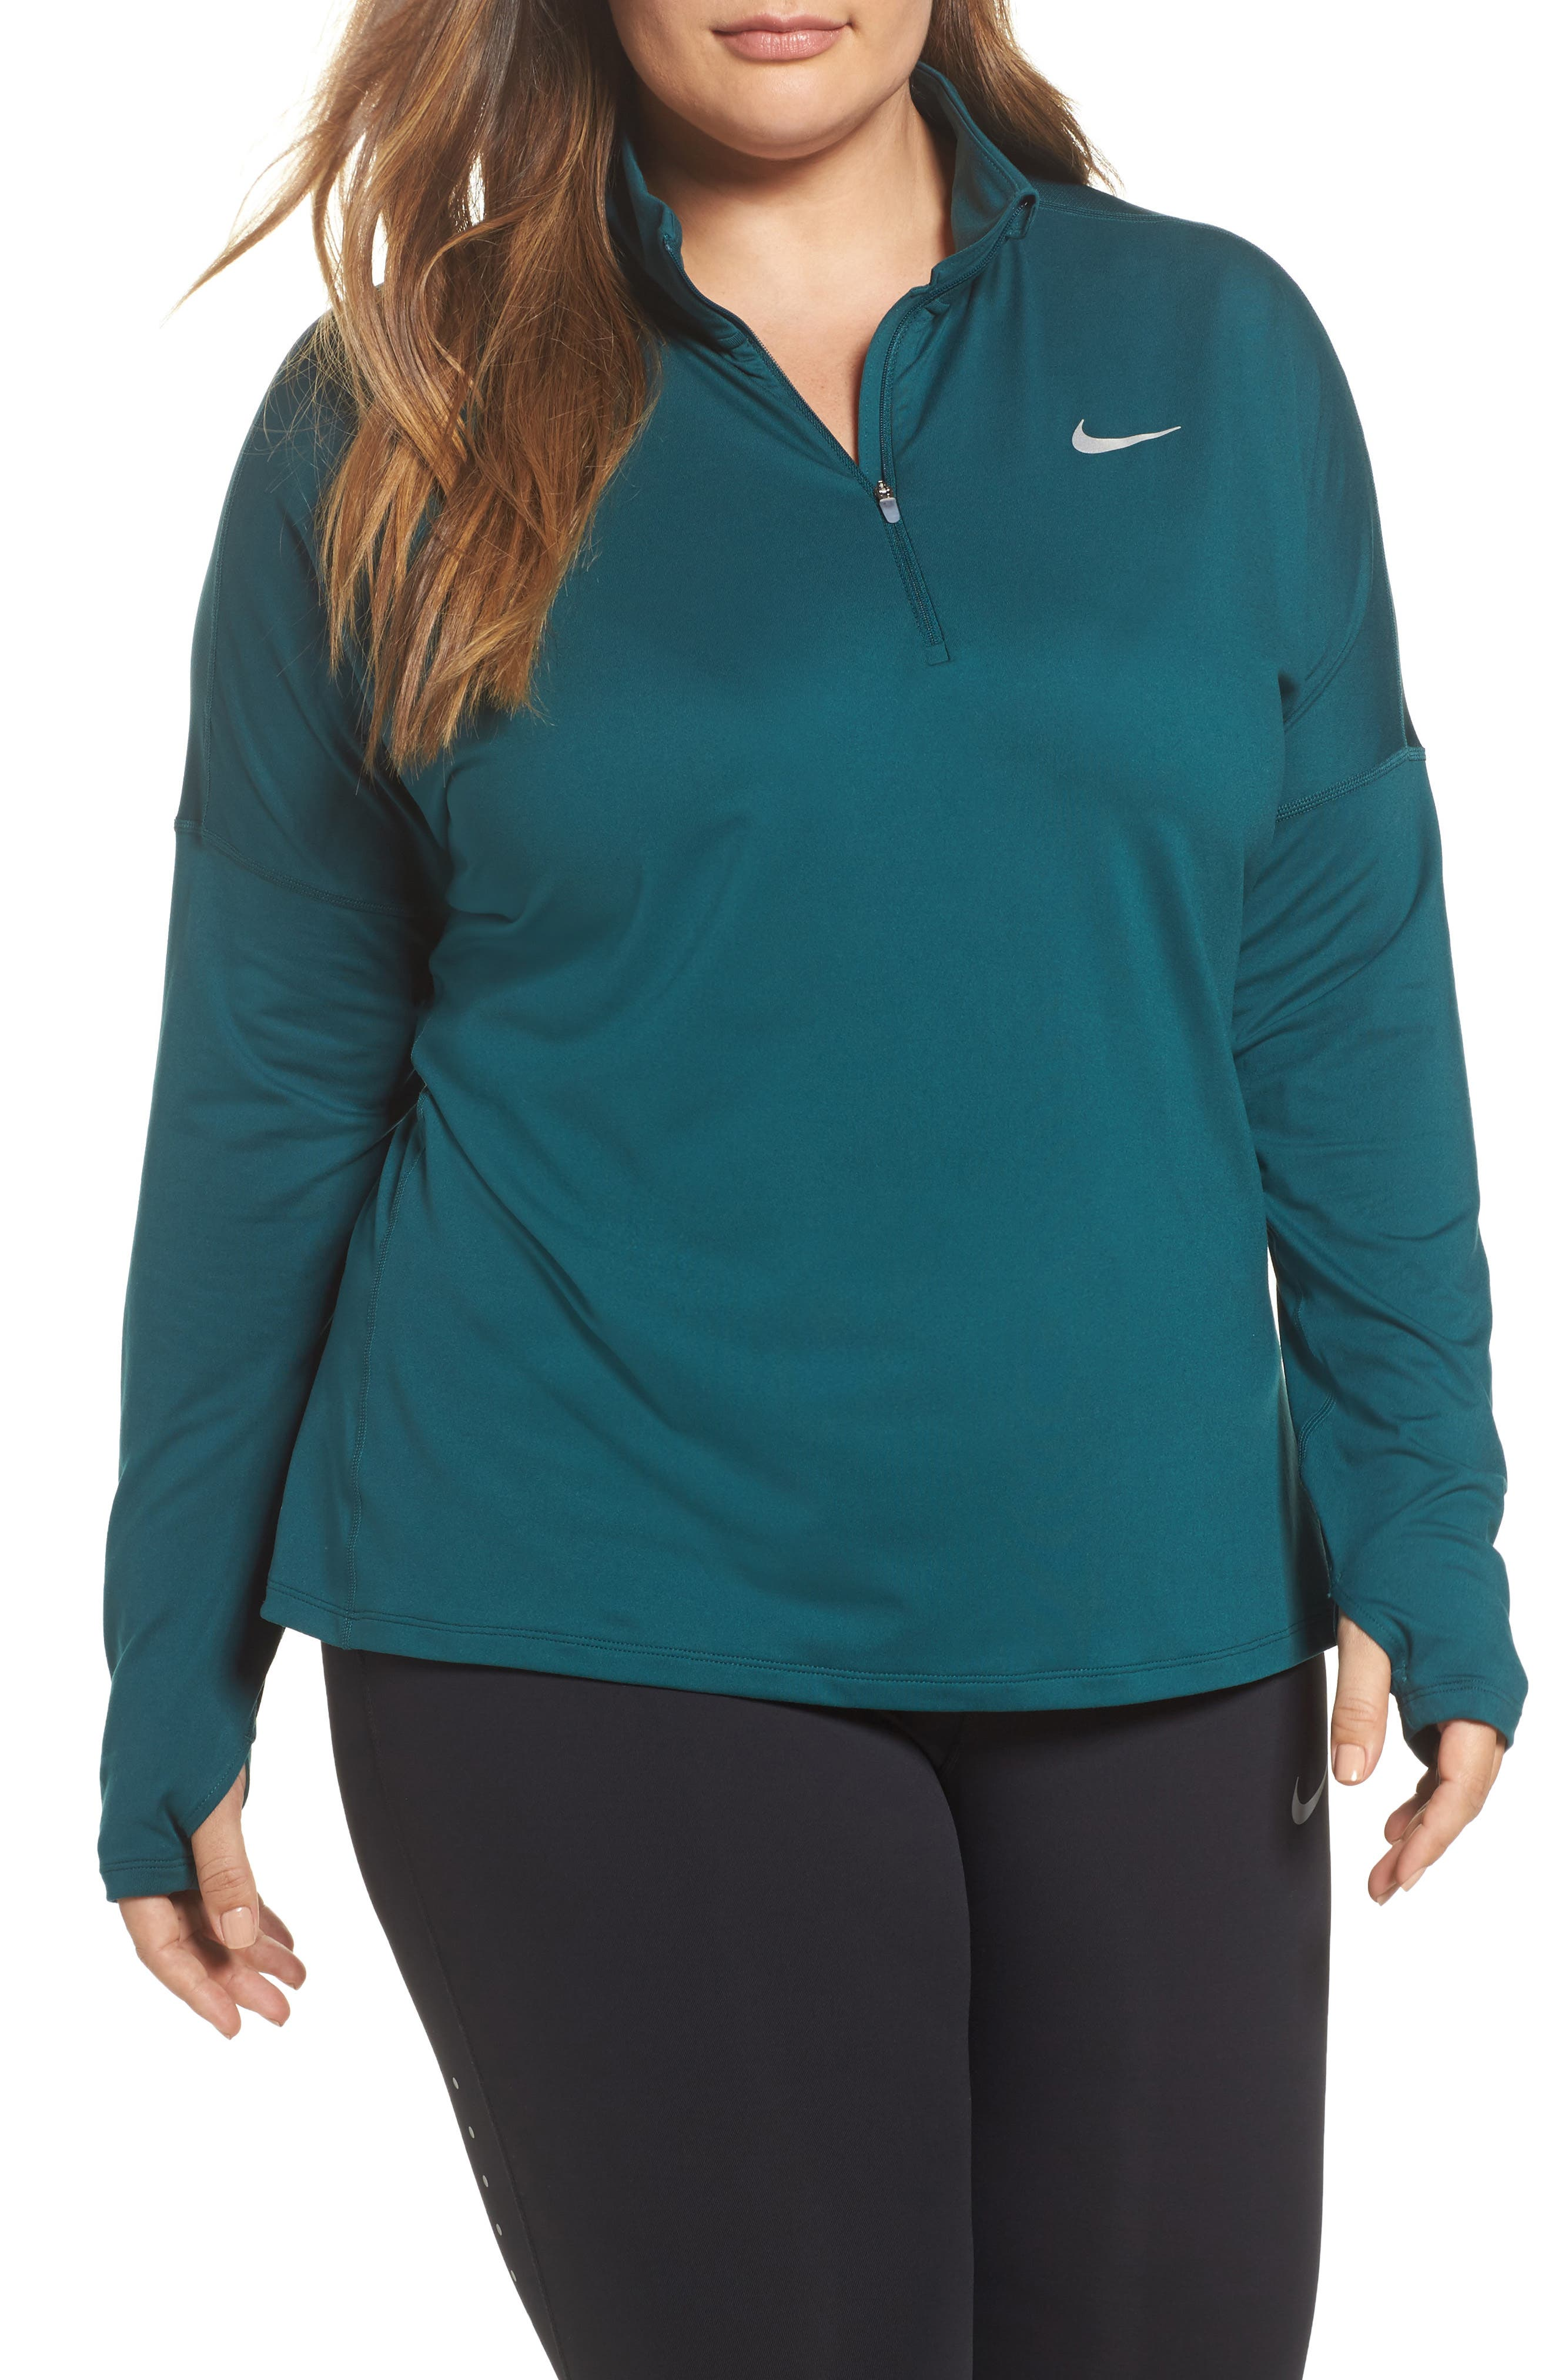 Alternate Image 1 Selected - Nike Dry Element Half Zip Top (Plus Size)